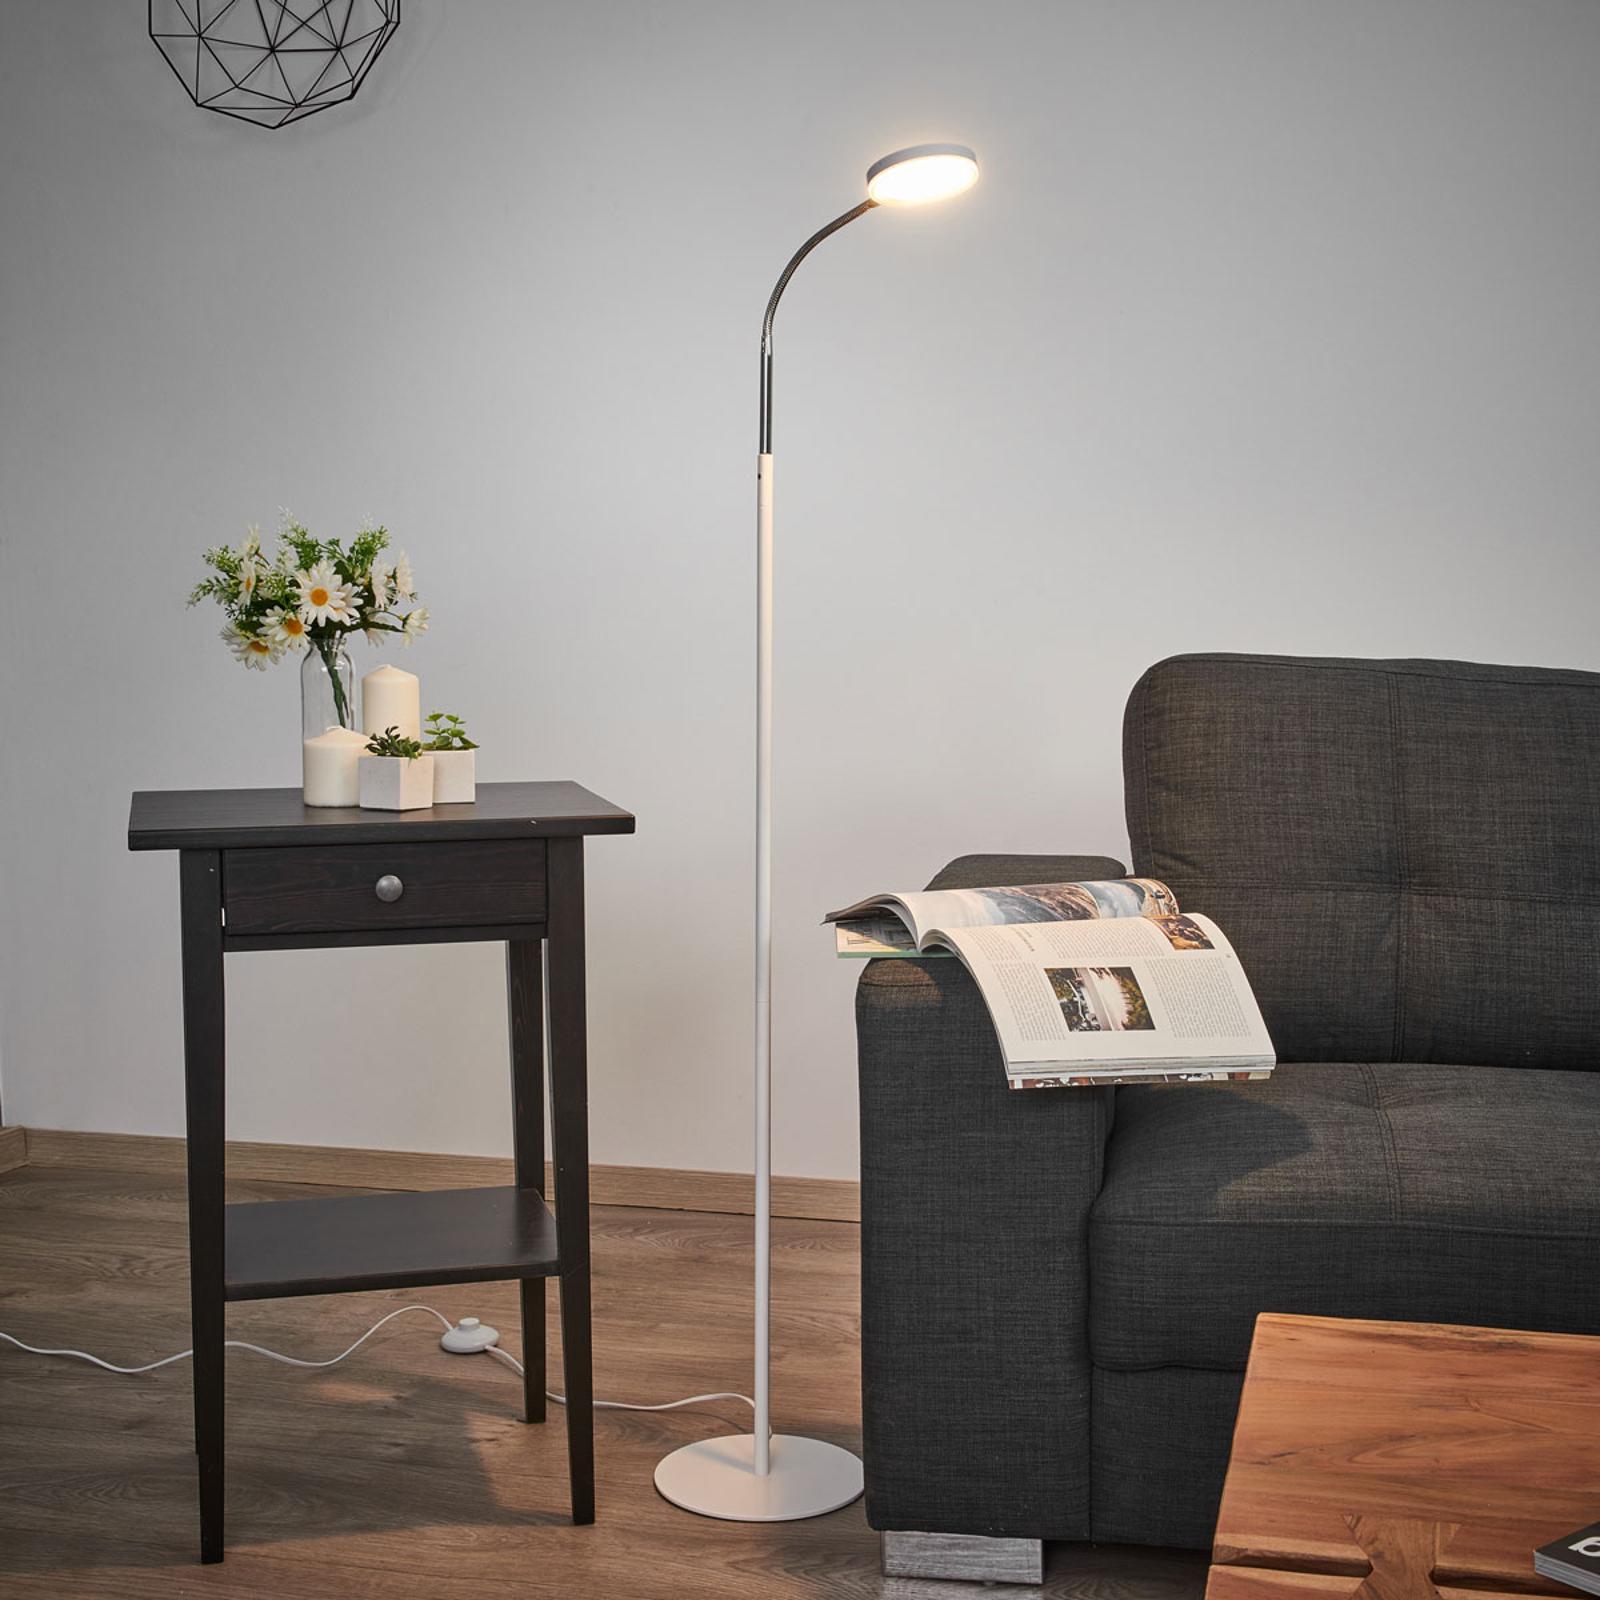 Milow - piantana LED a collo di cigno